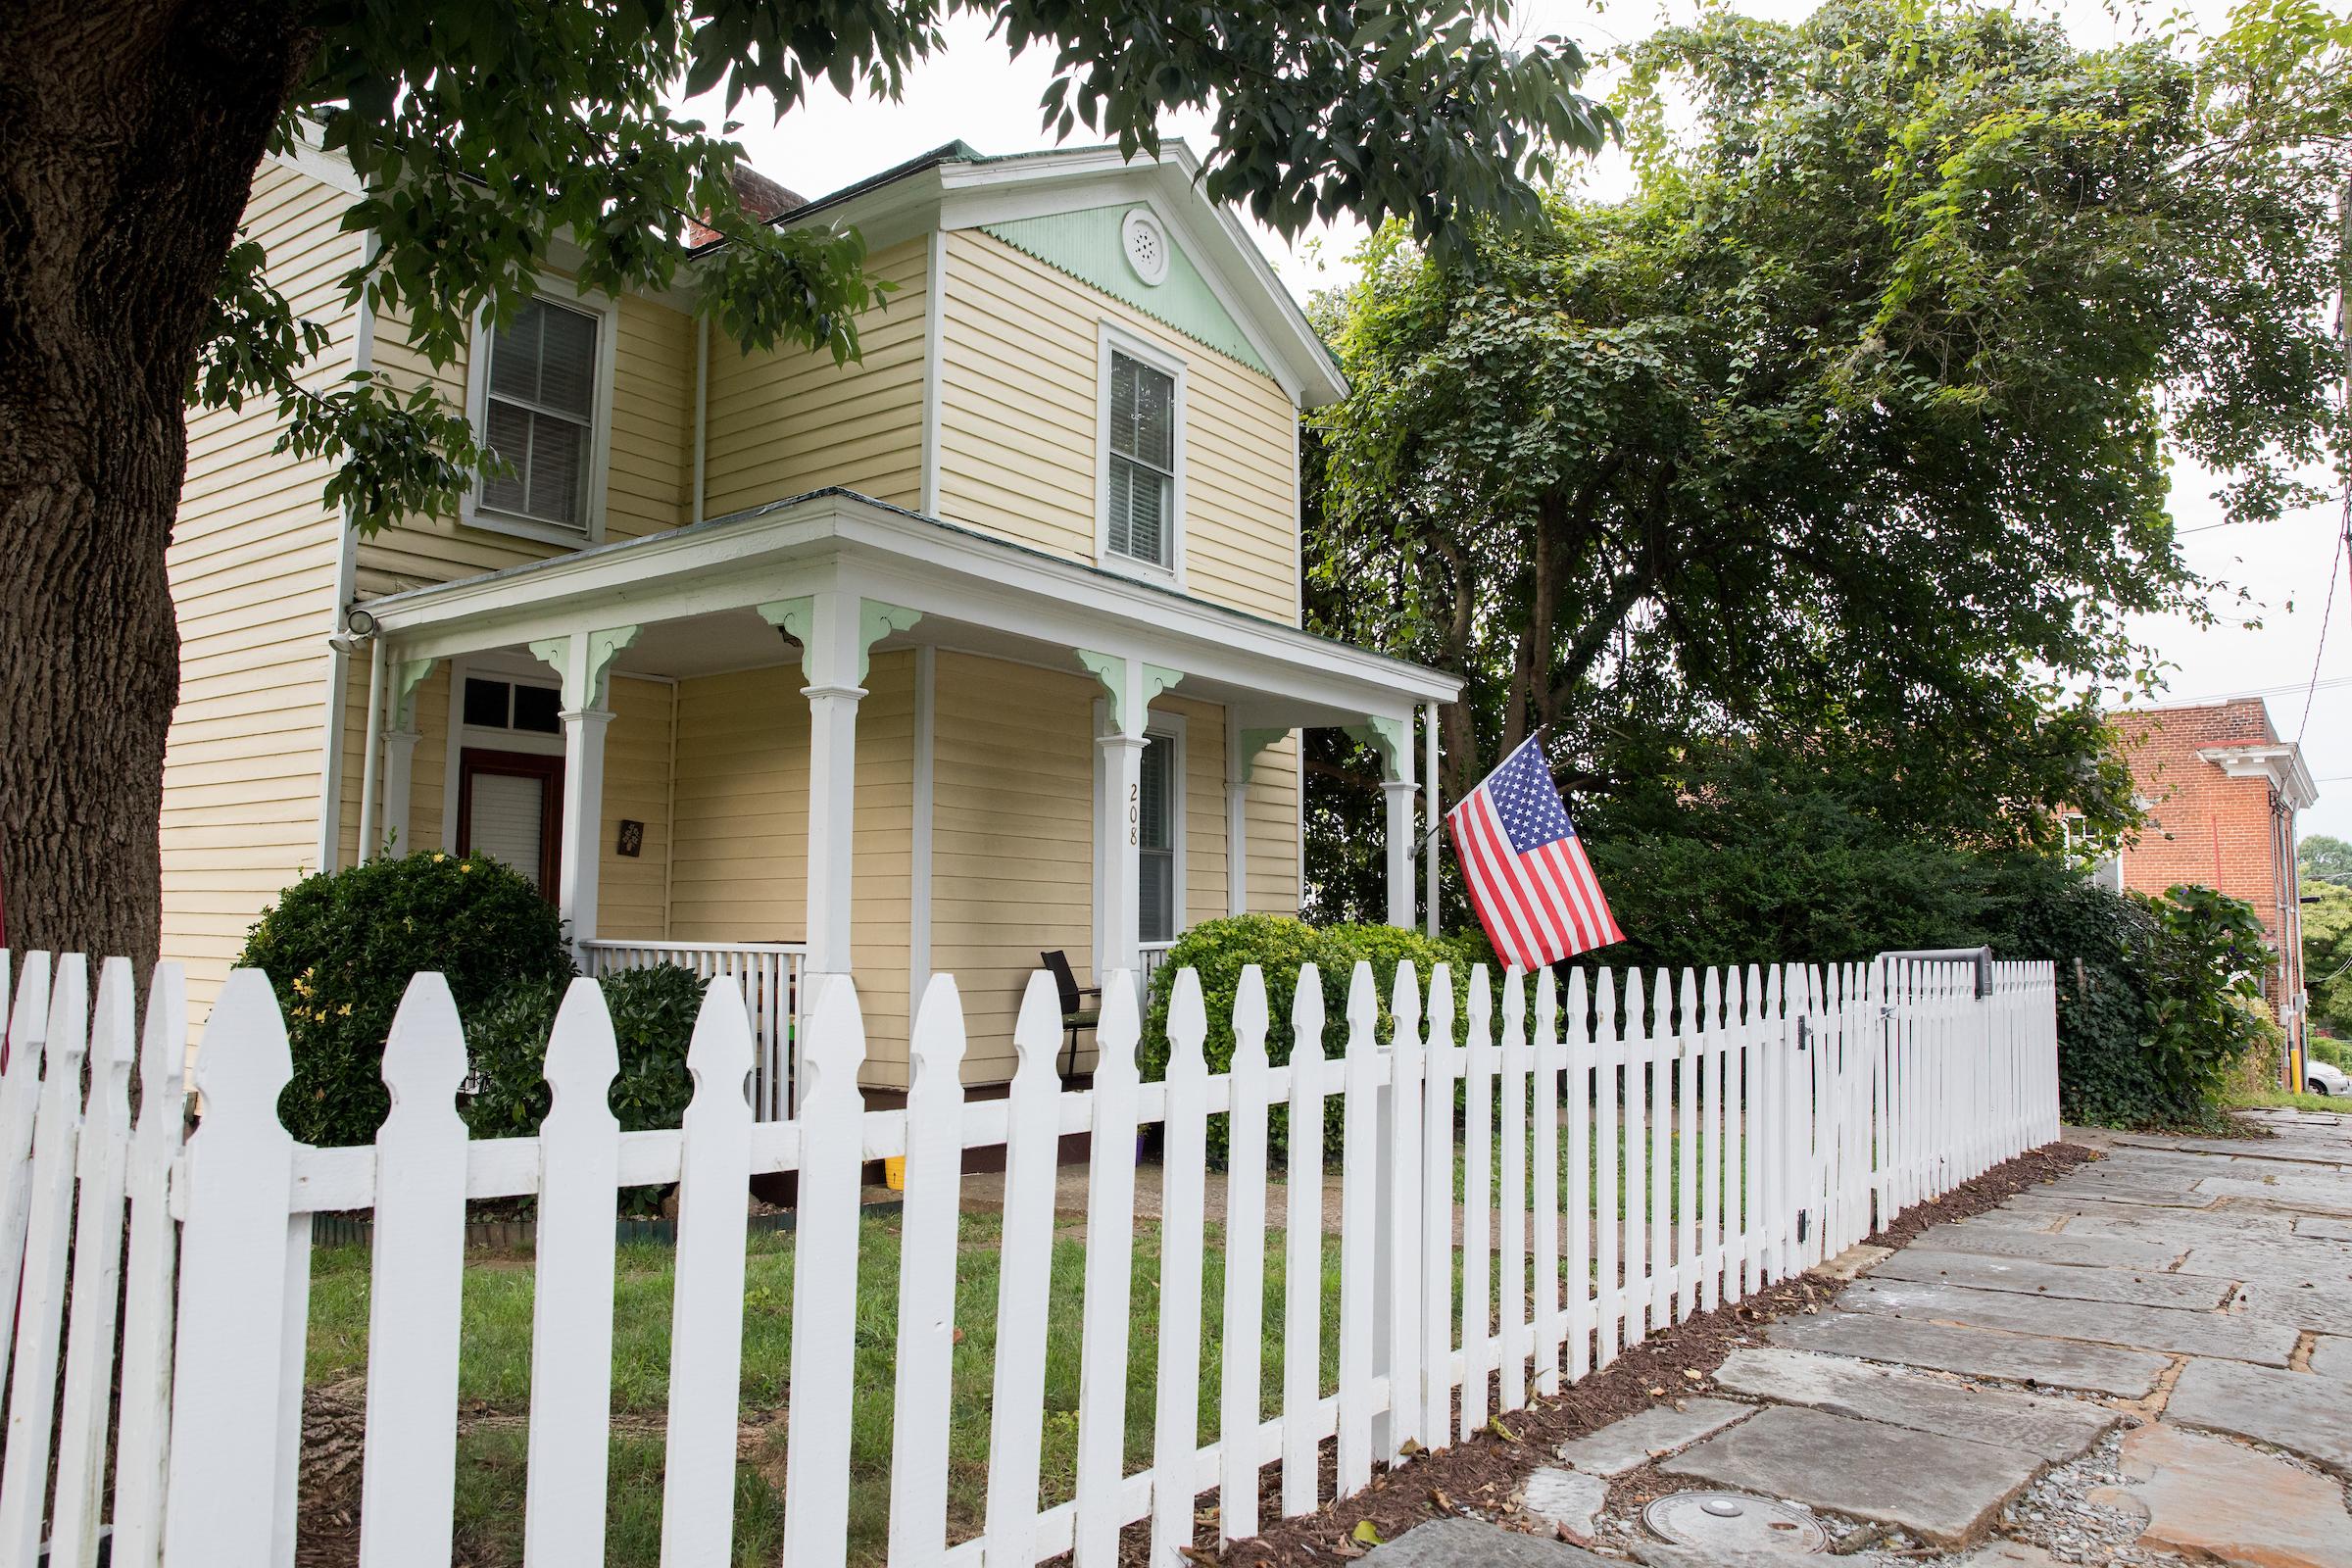 Waugh house 208 F St 002.jpg